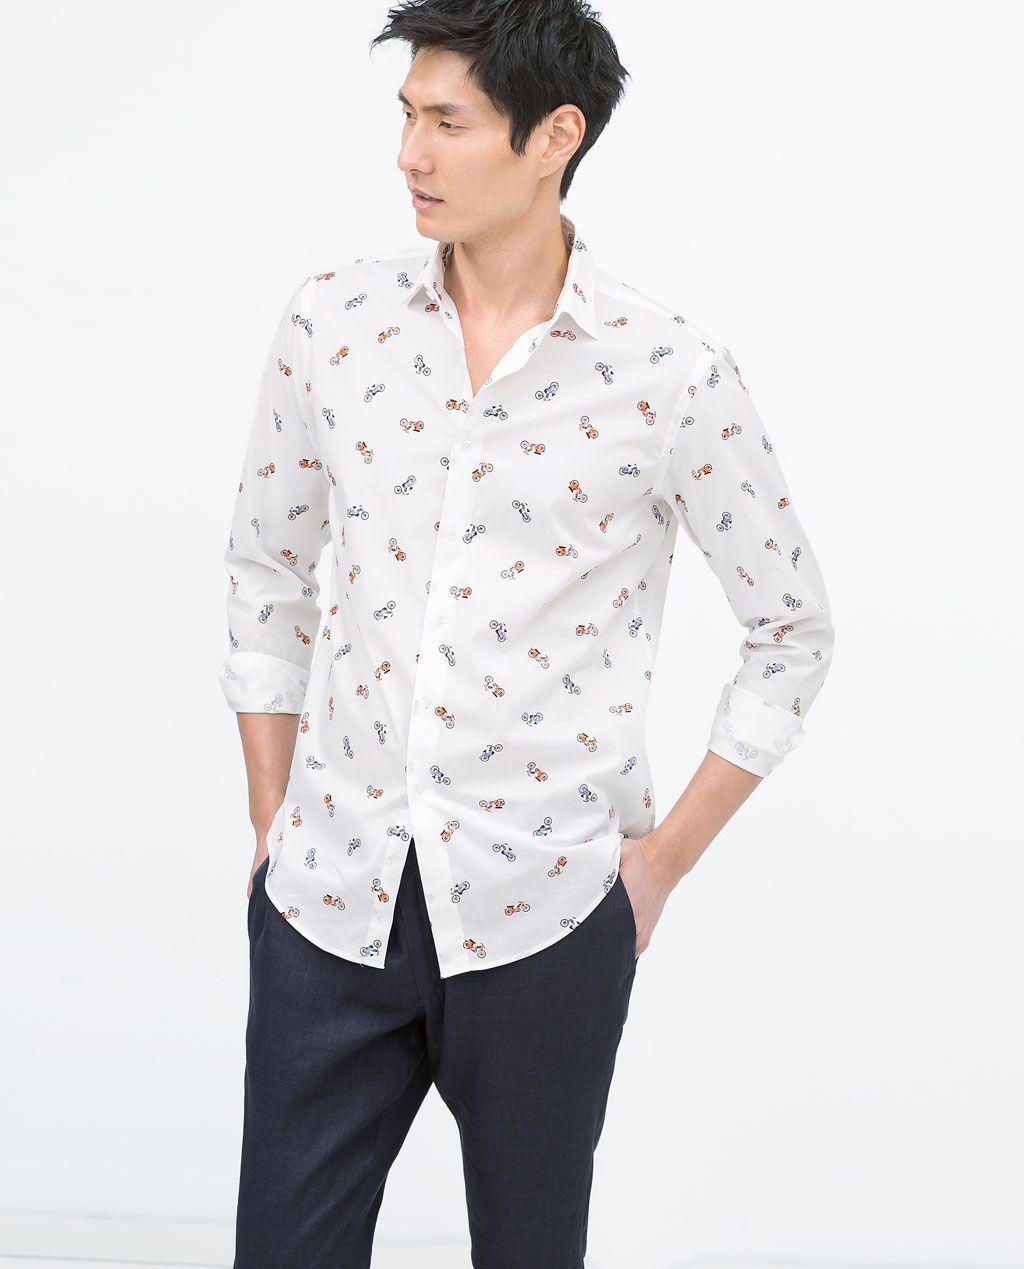 zara man poplin shirt mens shirts chemise. Black Bedroom Furniture Sets. Home Design Ideas